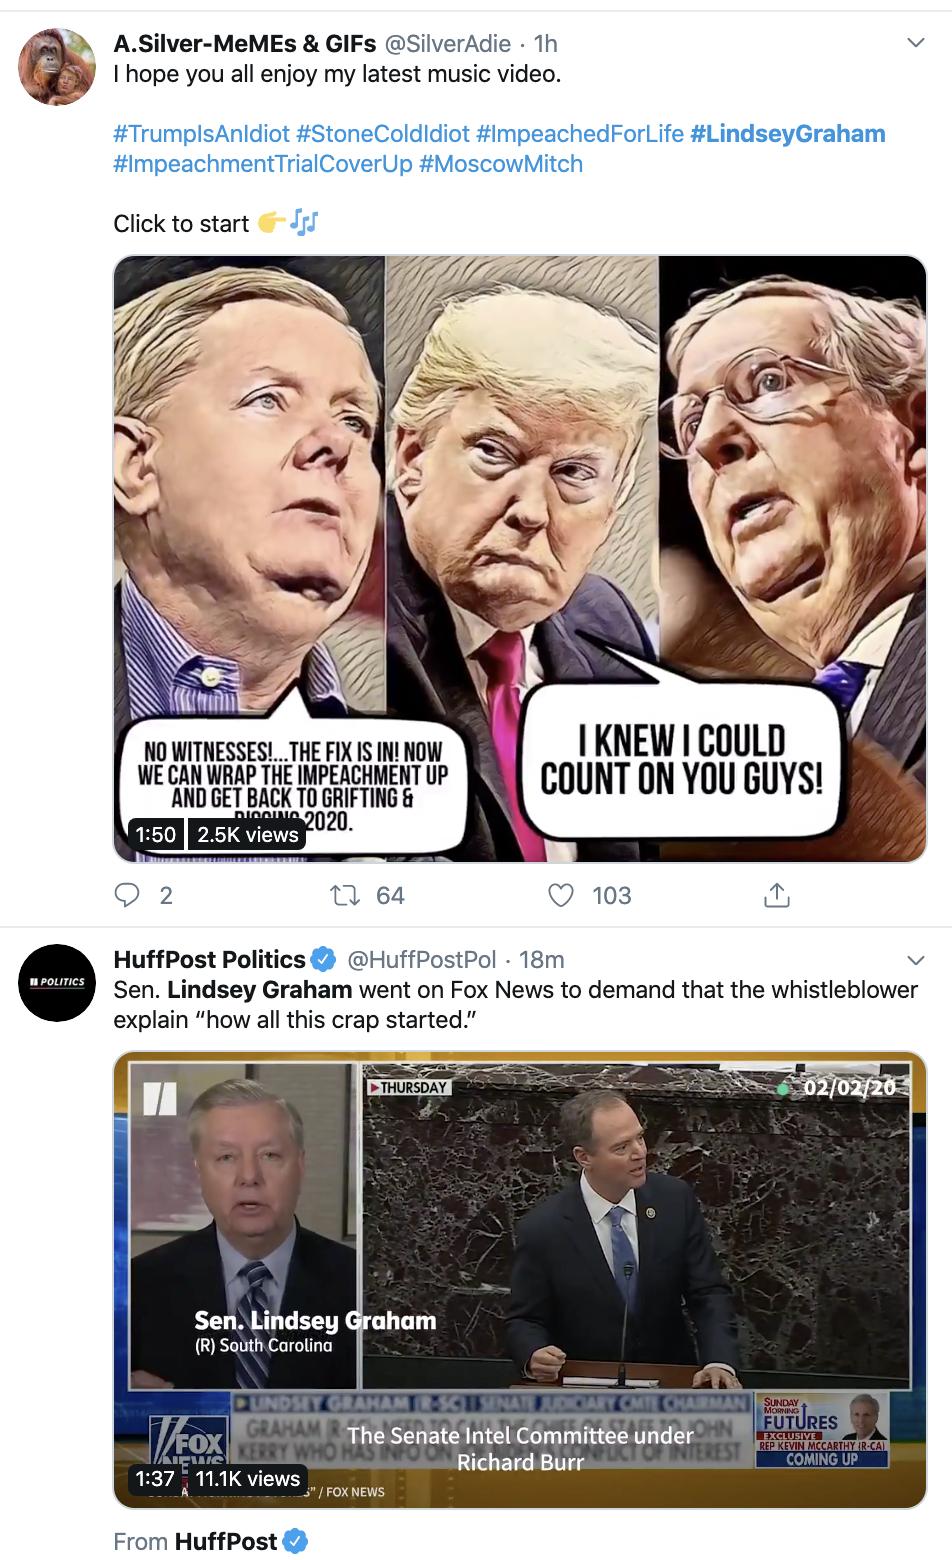 Screen-Shot-2020-02-03-at-9.03.27-AM Graham Just Threatened The Trump Whistleblower Crime Fact-Checker Politics Top Stories